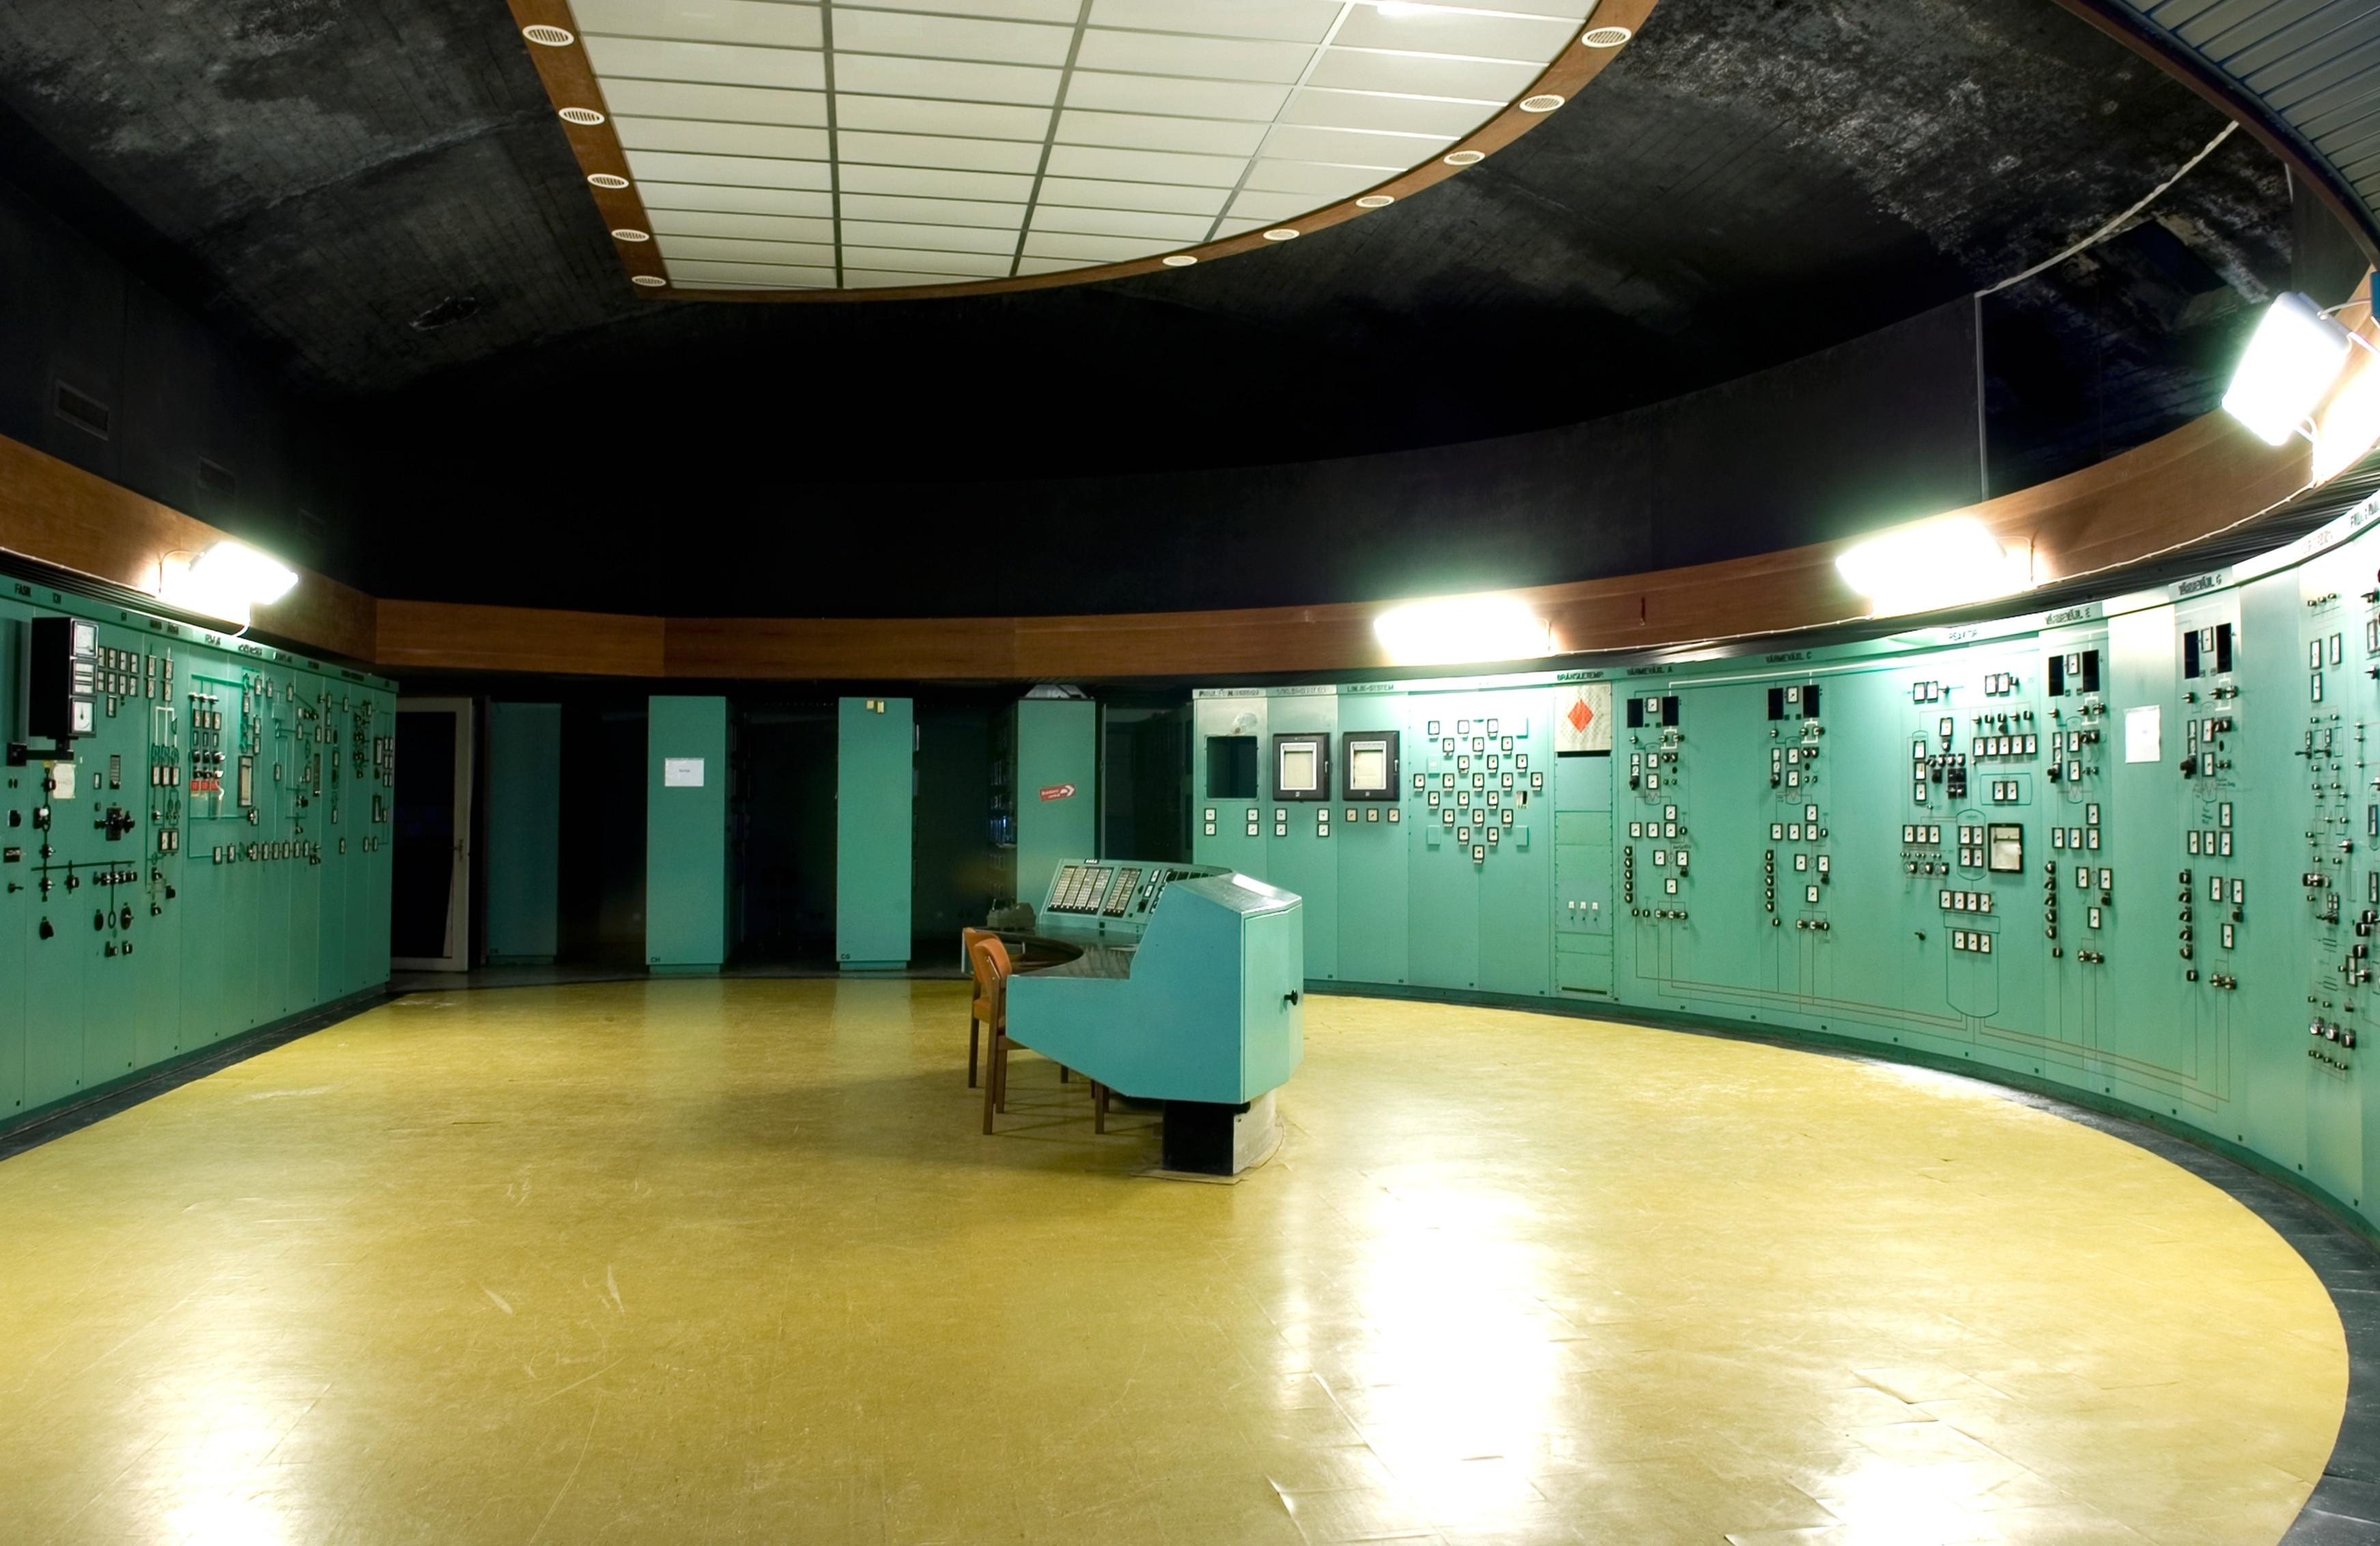 Ringhals stangde reaktor 4